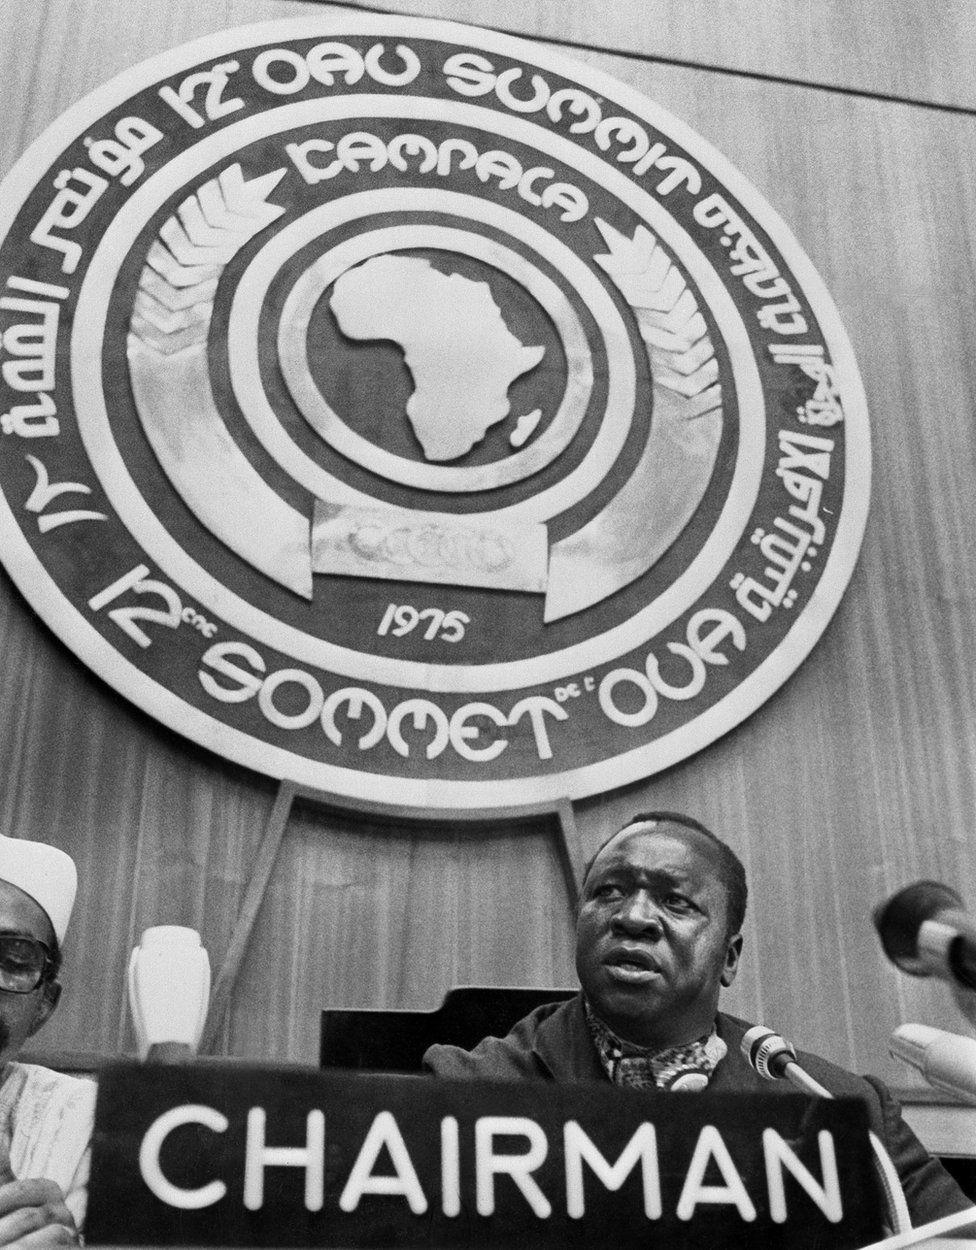 Uganda's President Idi Amin Dada chairs the 12th Organisation of African Unity (OAU) summit in August 1975 in Kampala